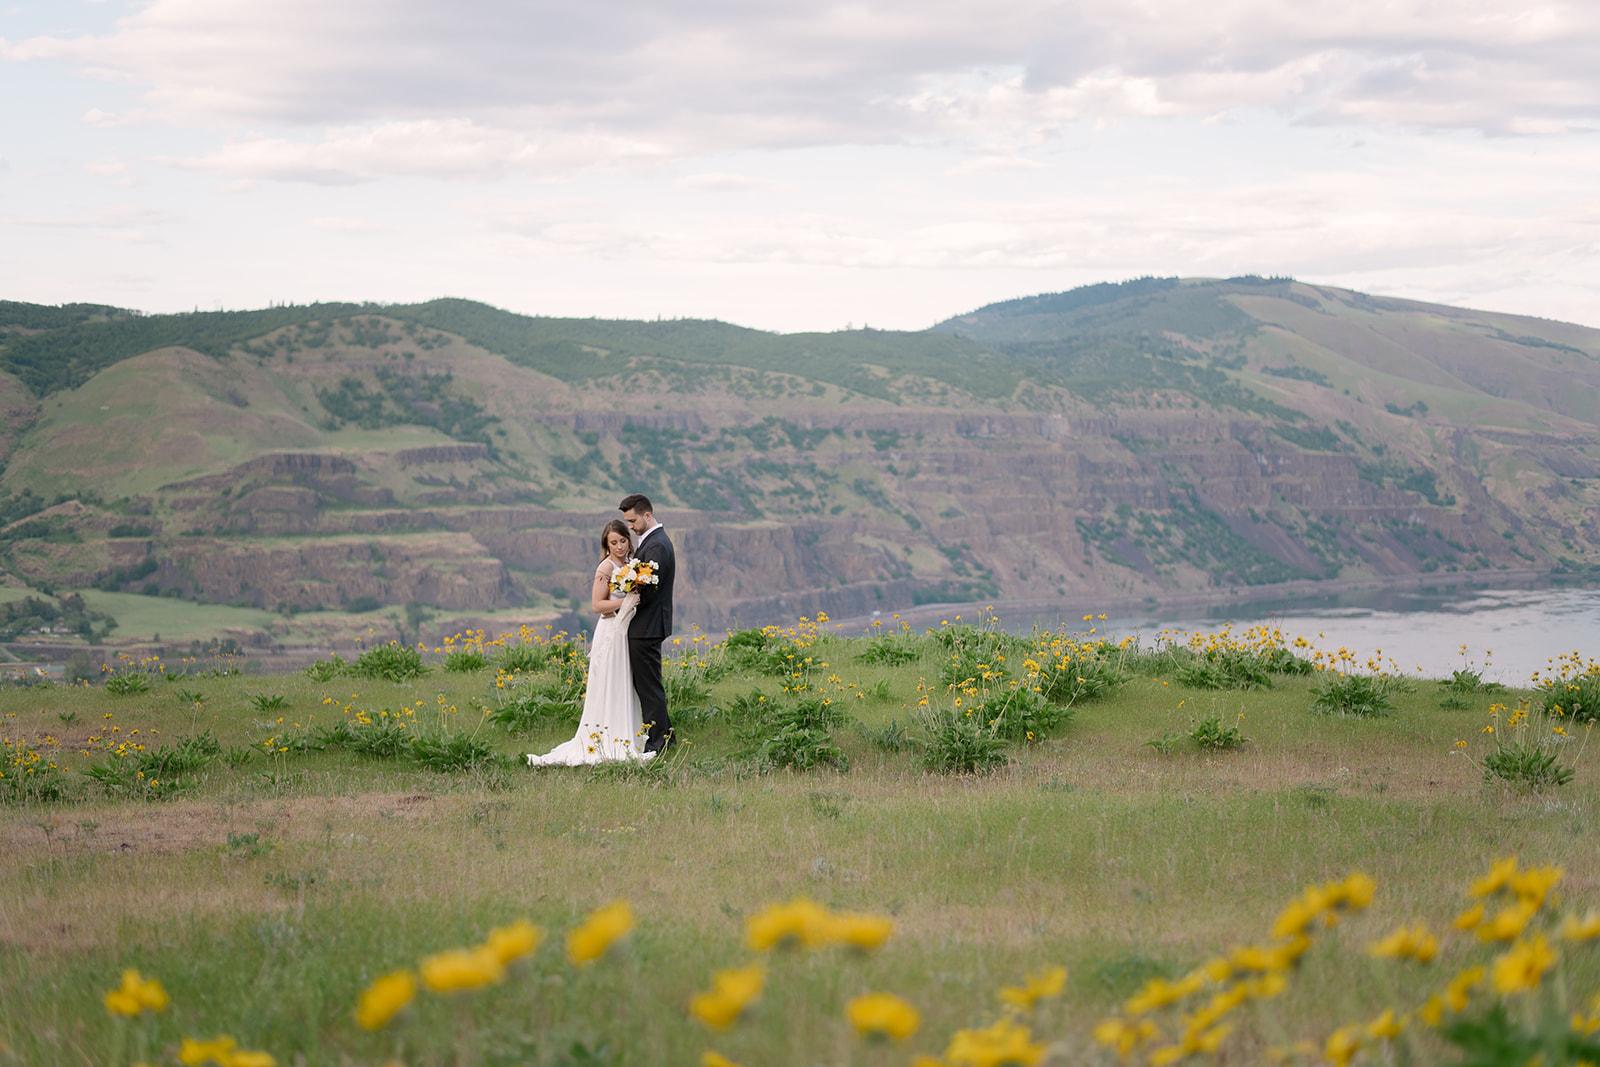 Bride & groom at Rowena Crest Viewpoint